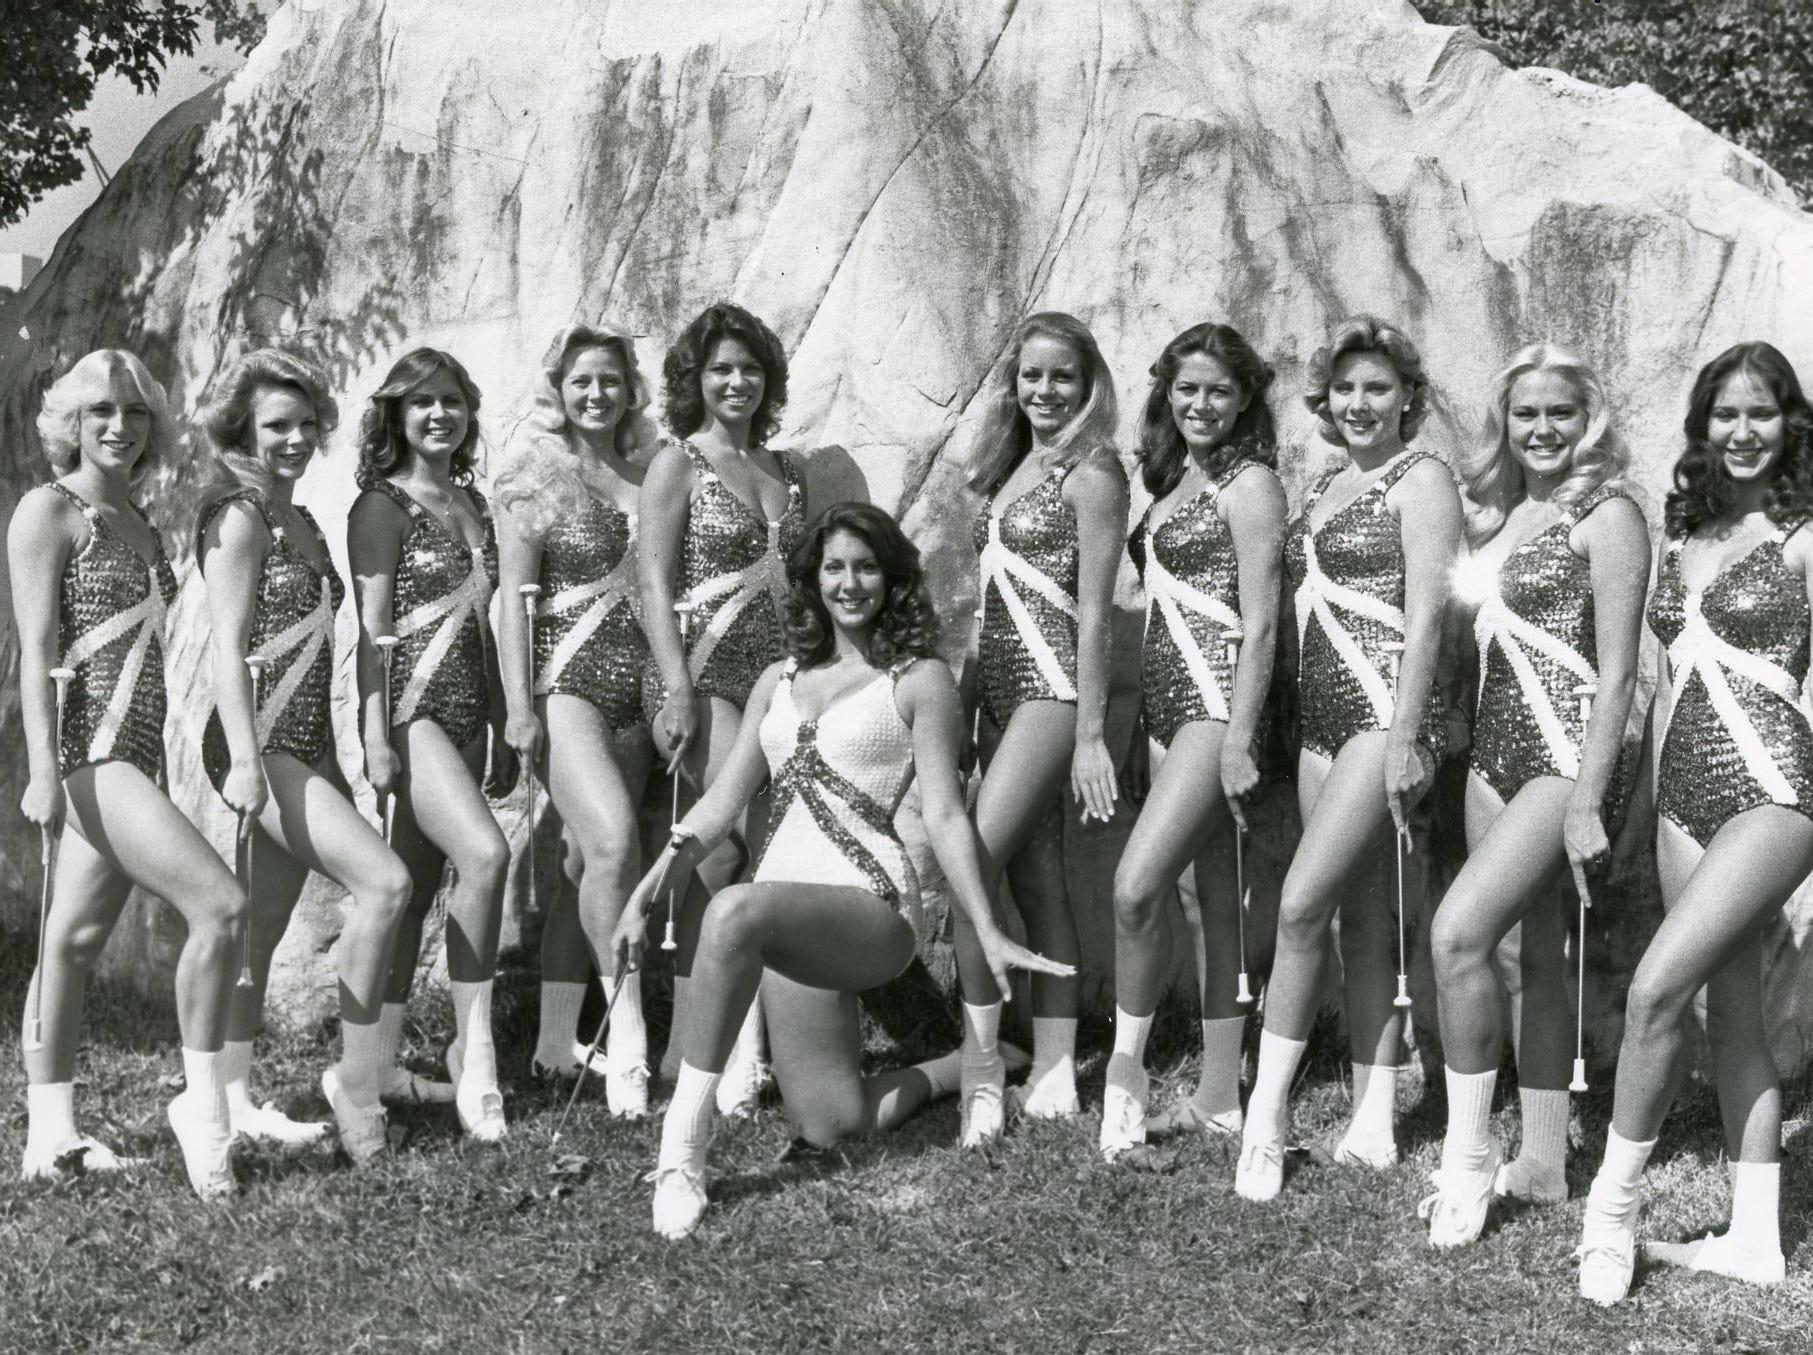 UT majorettes, 1979: Eileen Keeler, Robin Richardson, Betty Lowe, Kather Thrower, Debra McCarrell, Sandy Brown, Karen Beeler, Dawn Pearson, Marty Browning, Angela Floyd; (kneeling) head majorette Nancy Dolfi.